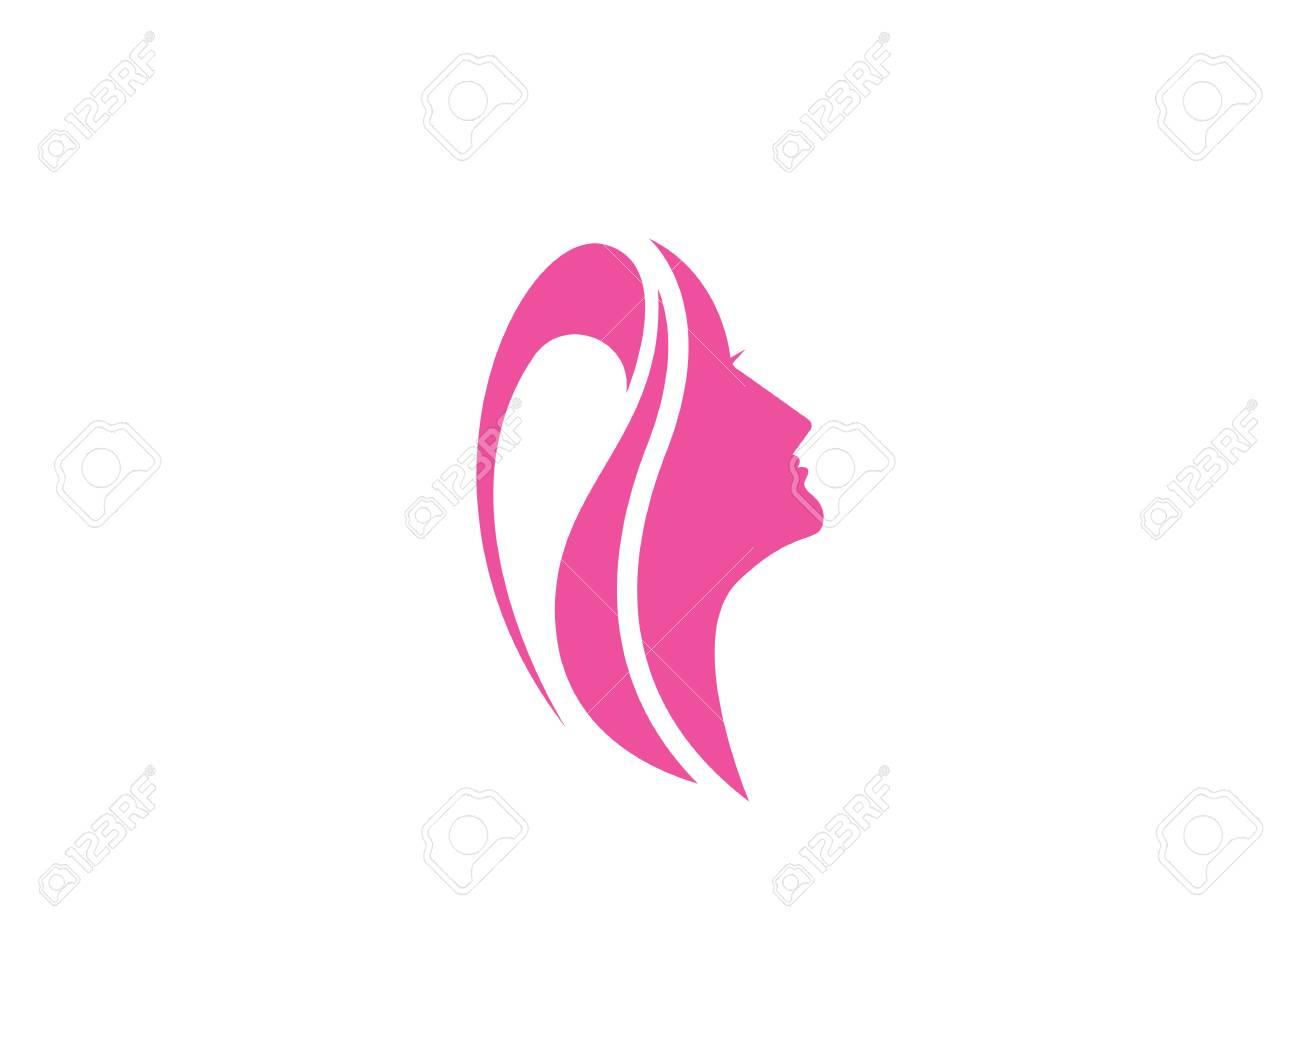 Face Woman Beauty Spa Logo Design Illustration Royalty Free